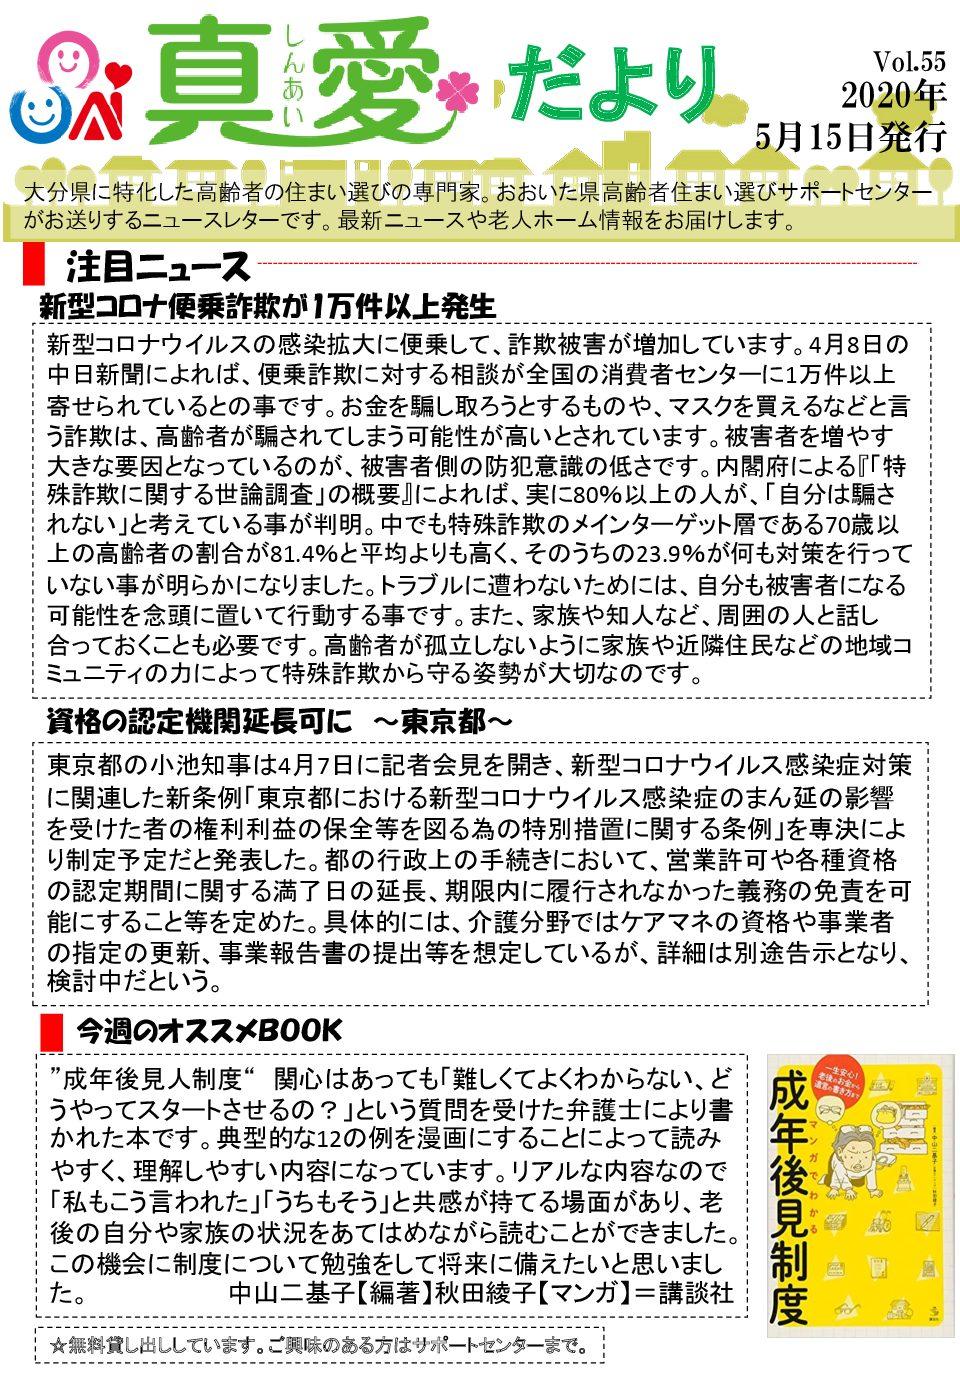 【Vol.55】 2020.05.15発行